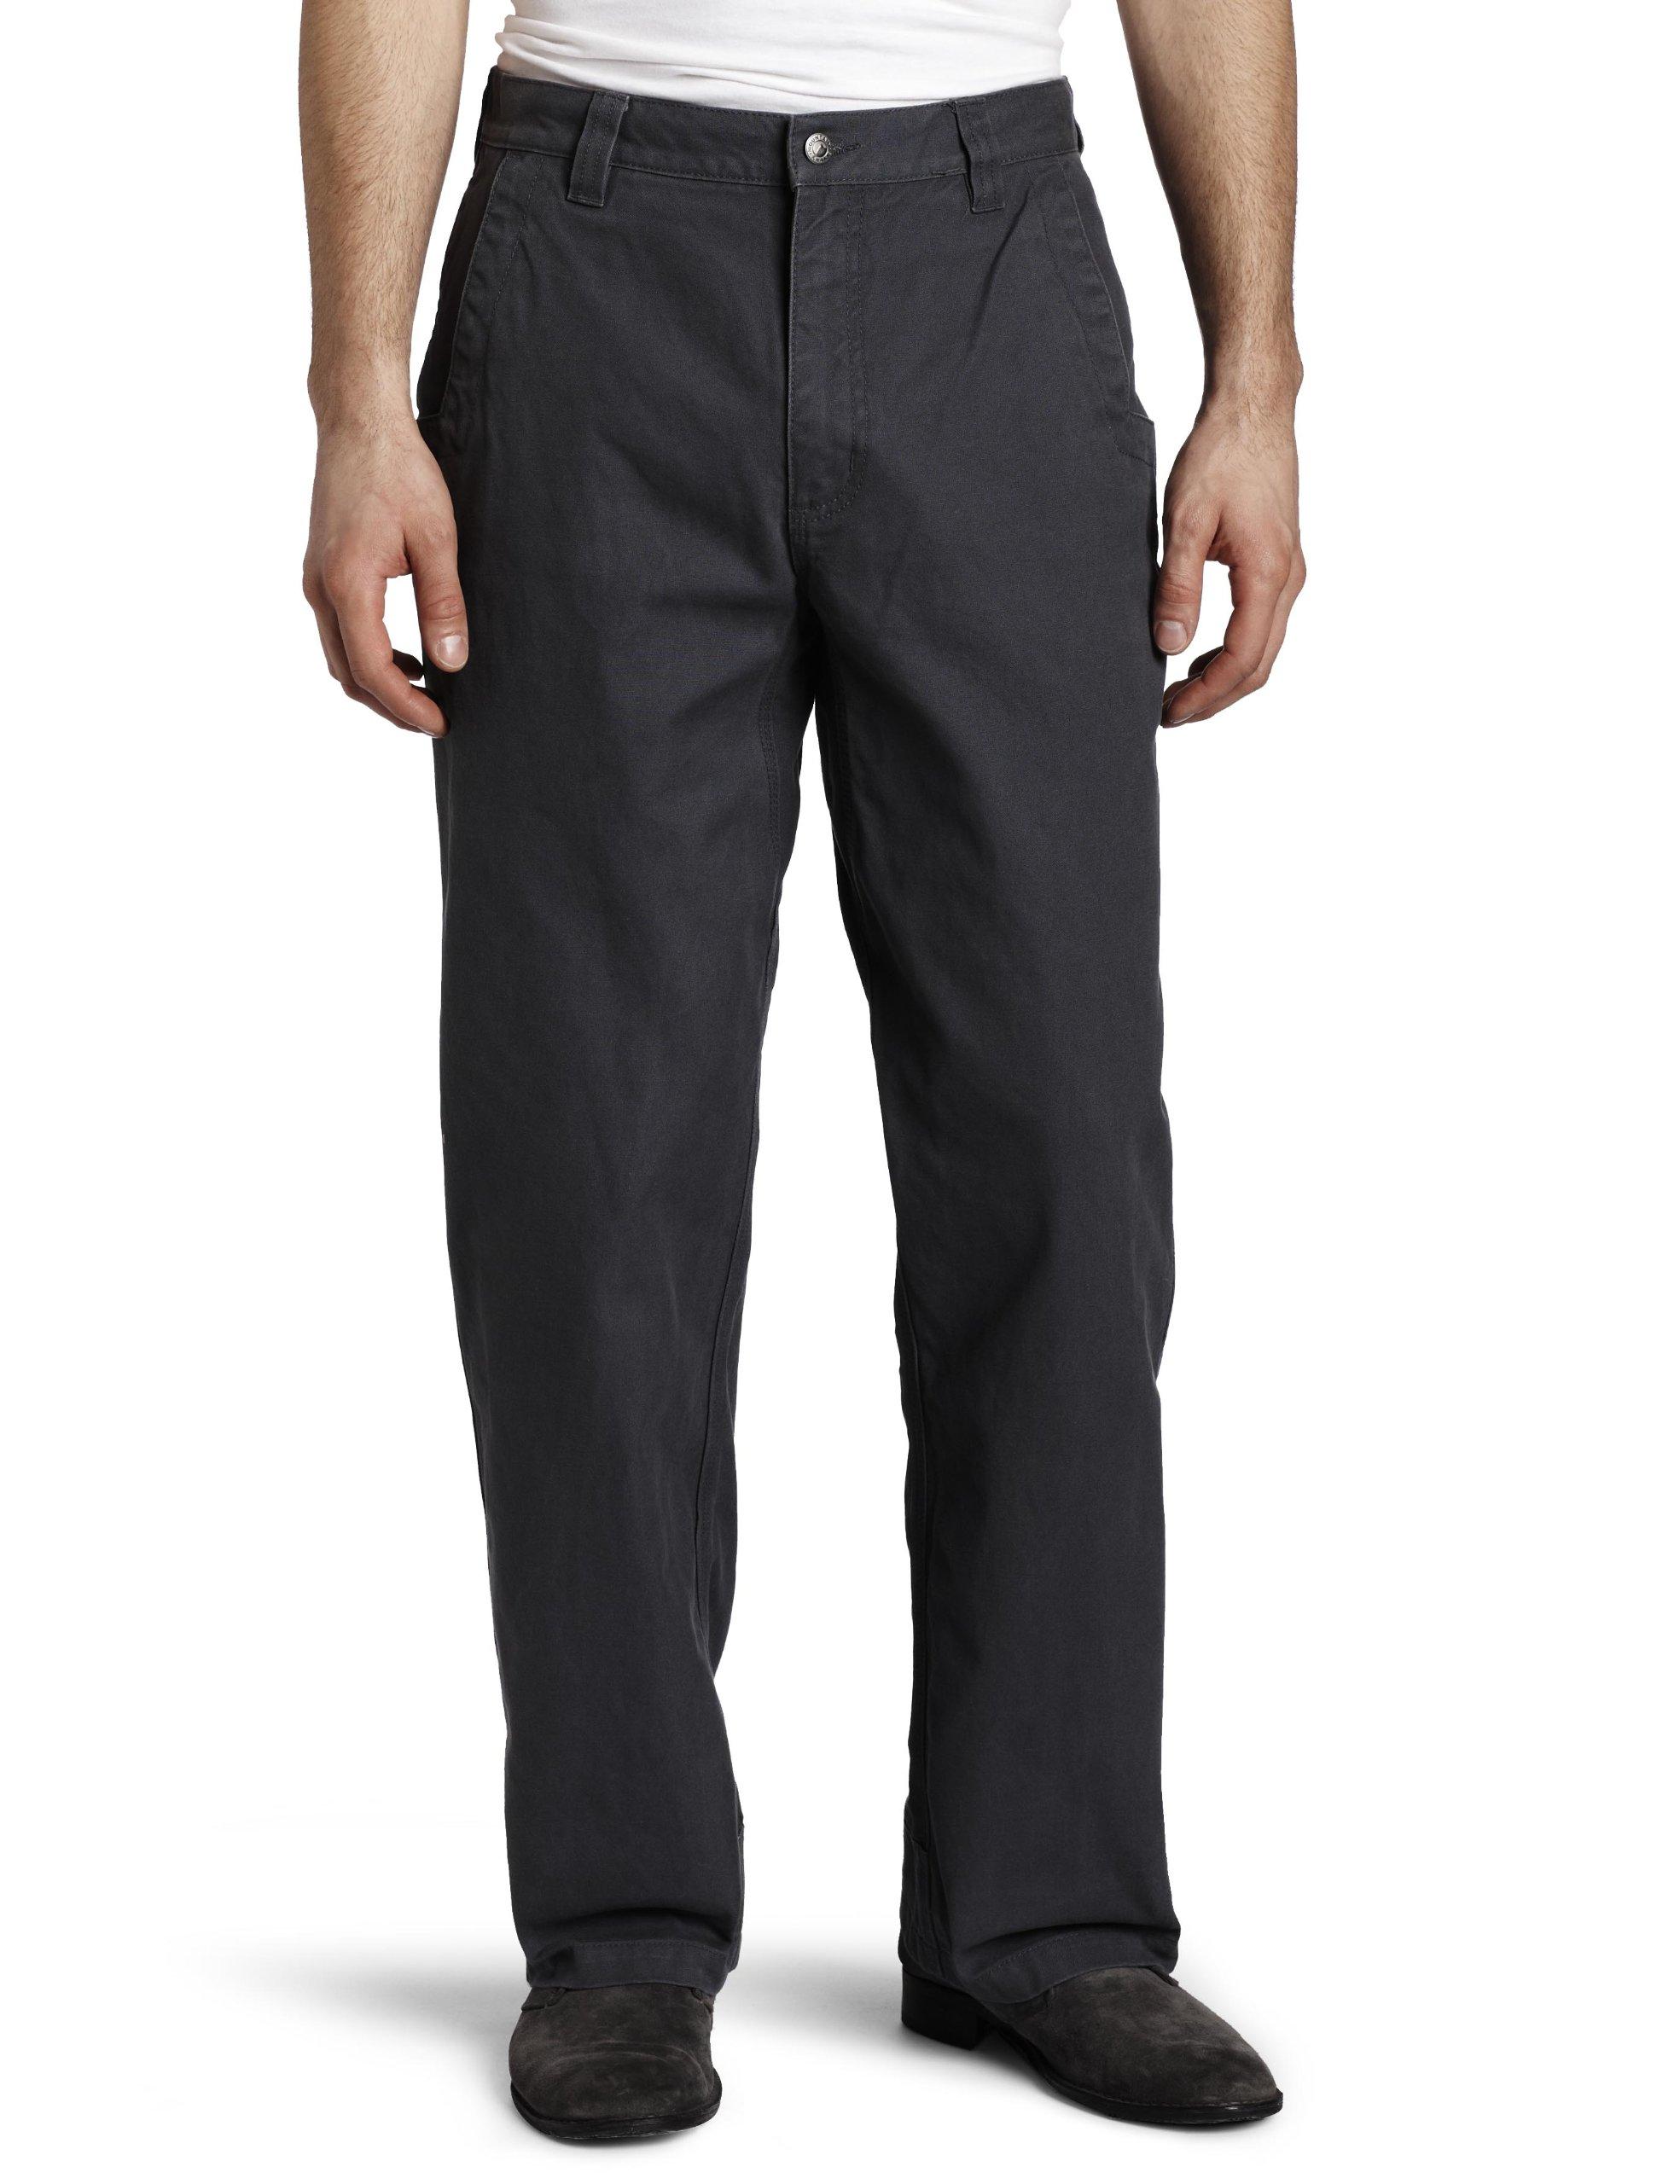 Mountain Khakis Men's Original Mountain Pant Relaxed Fit Granite 28W 32L